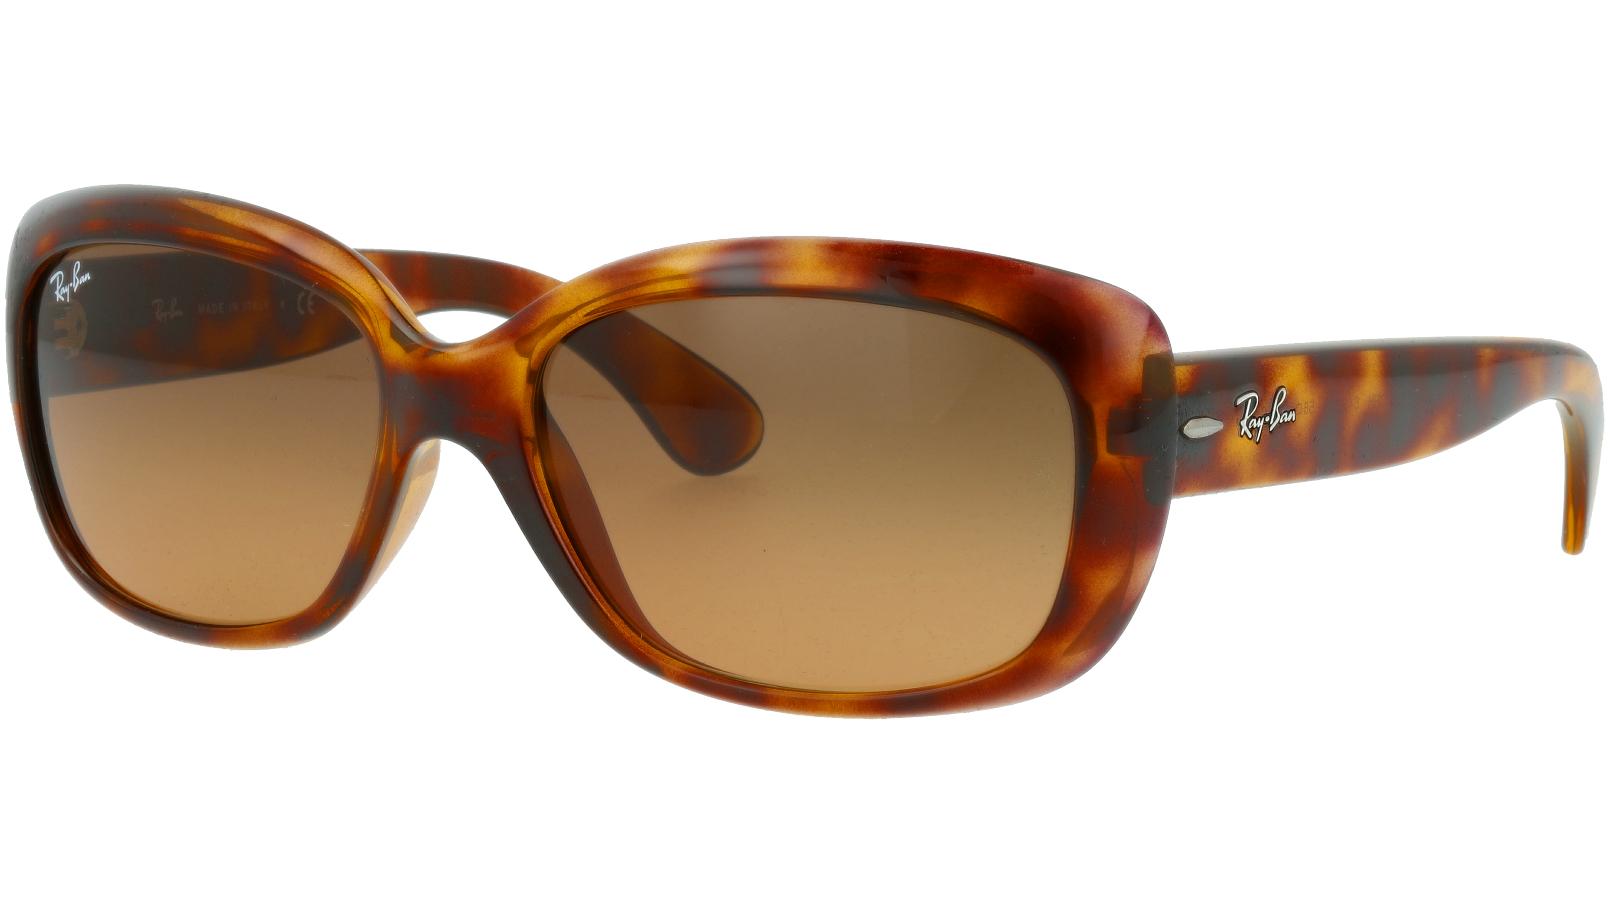 Ray-Ban RB4101 642/43 Havana Sunglasses